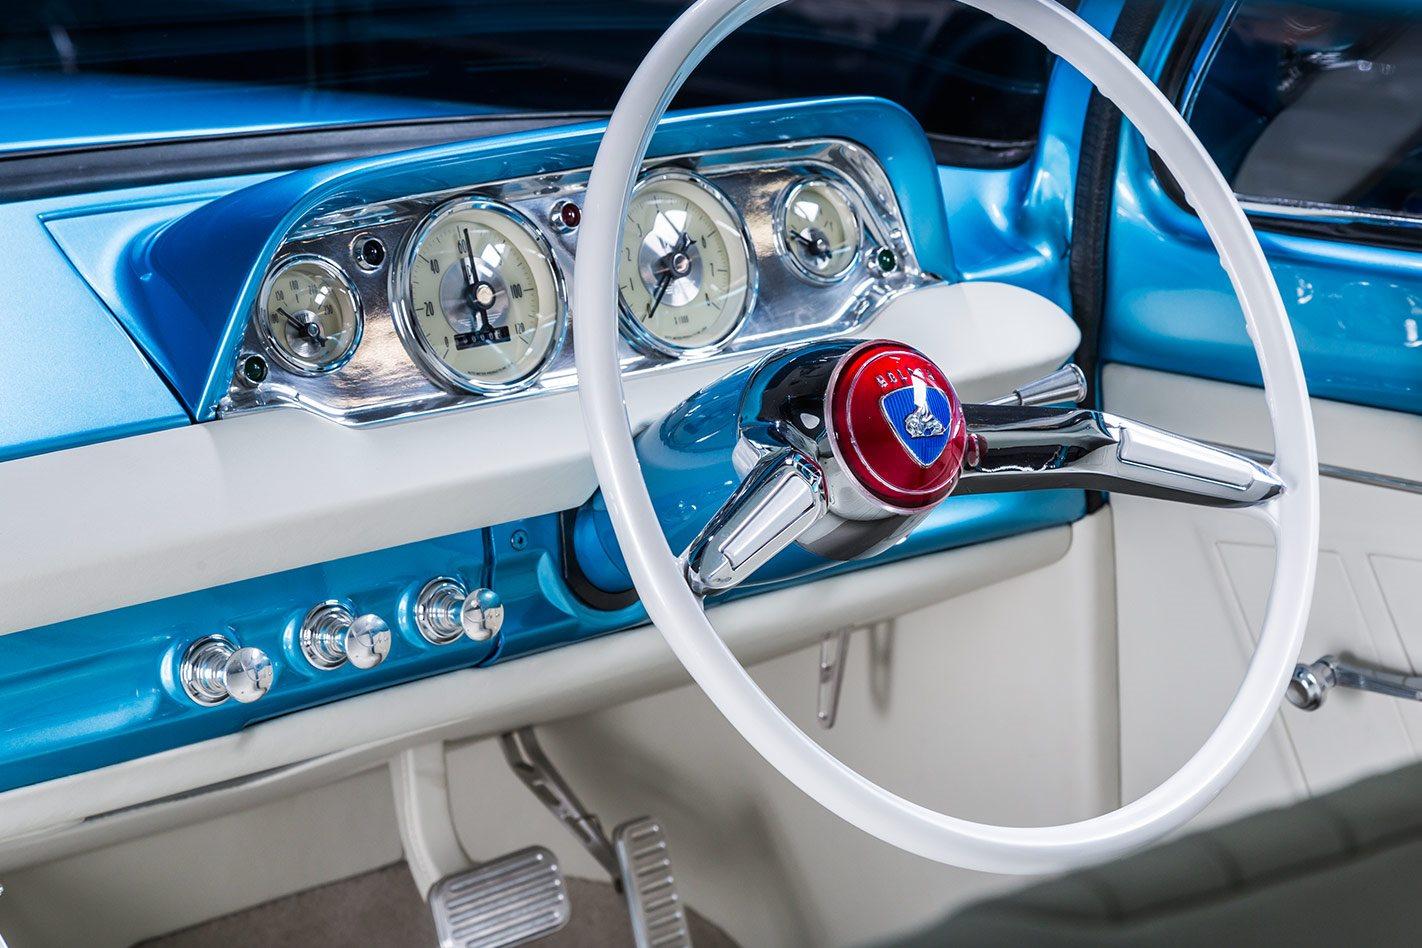 Elite Level Holden Eh Wagon Streeter